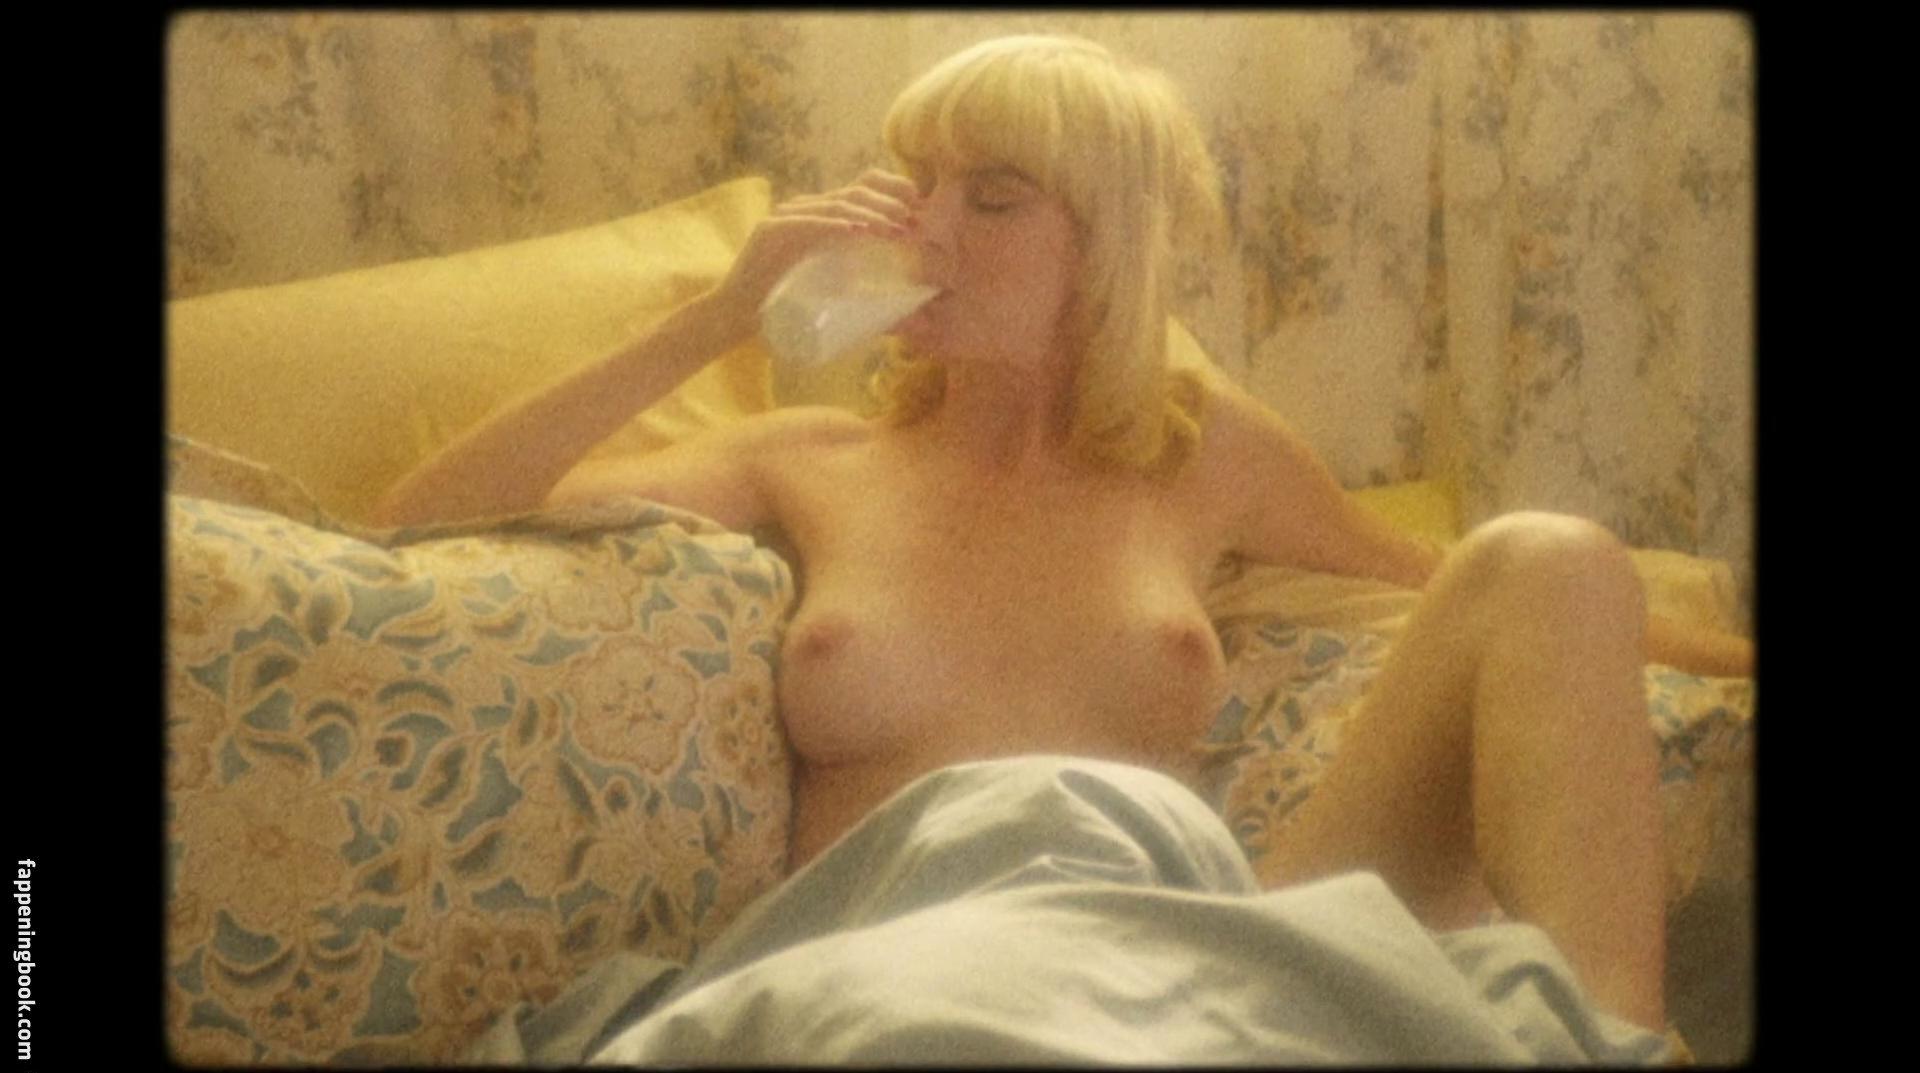 Anastasia Baranova Naked eugenia kuzmina nude, sexy, the fappening, uncensored